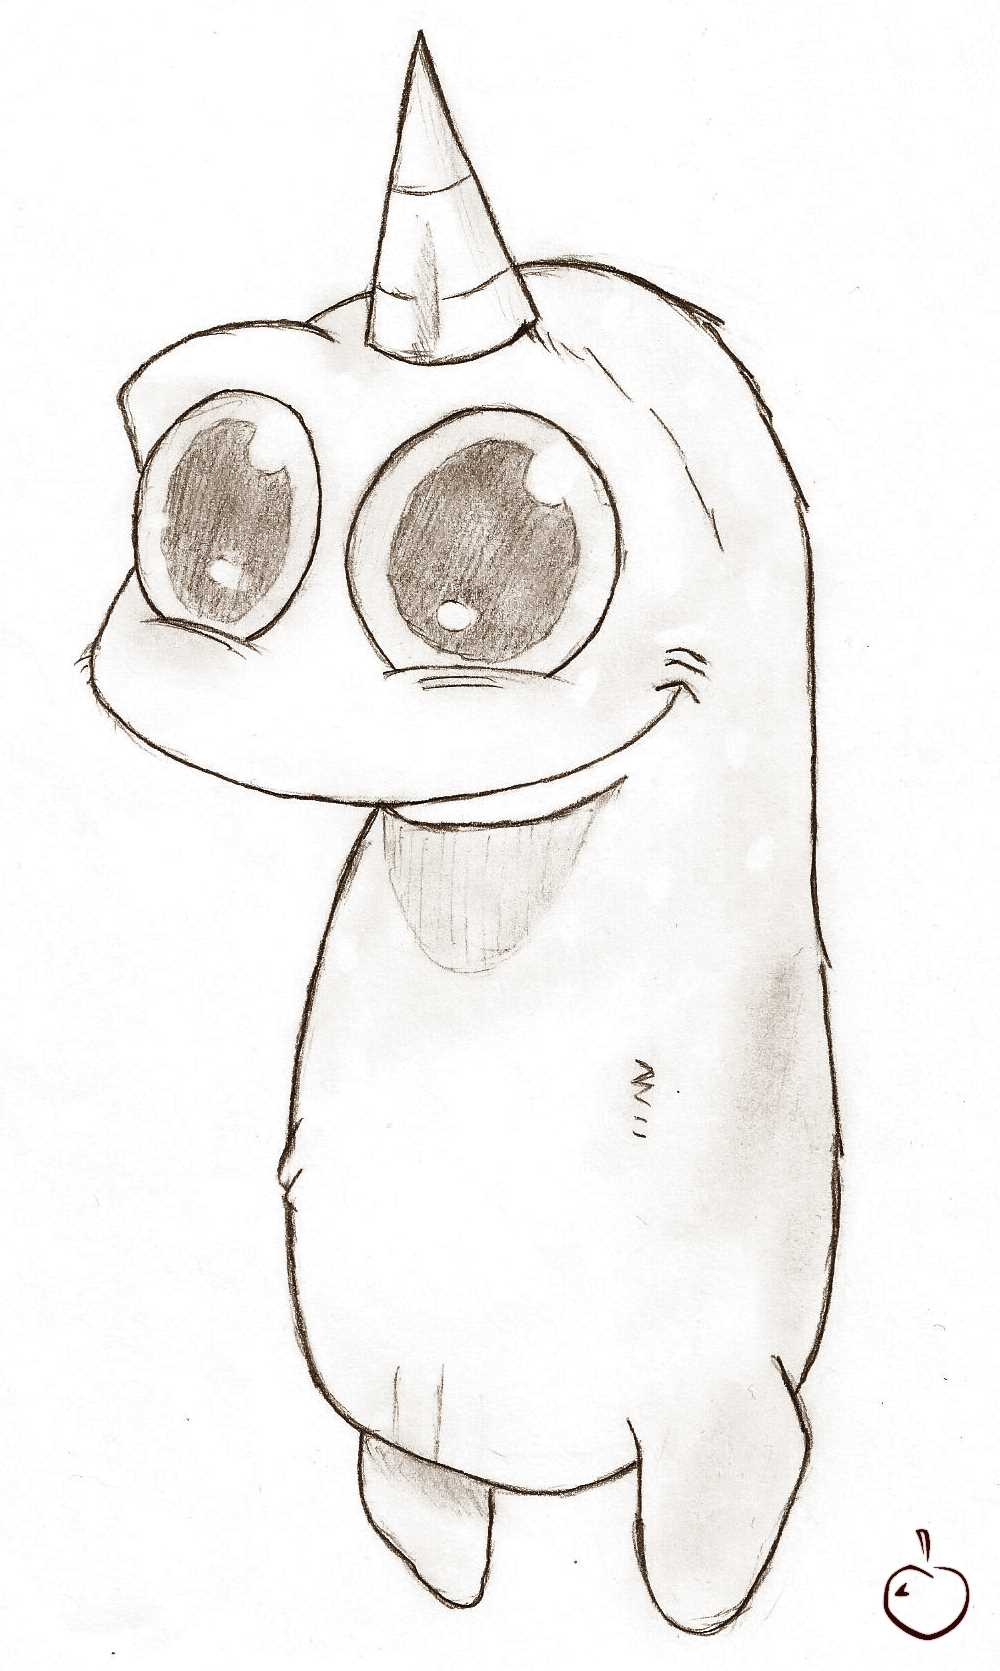 Smourbiff